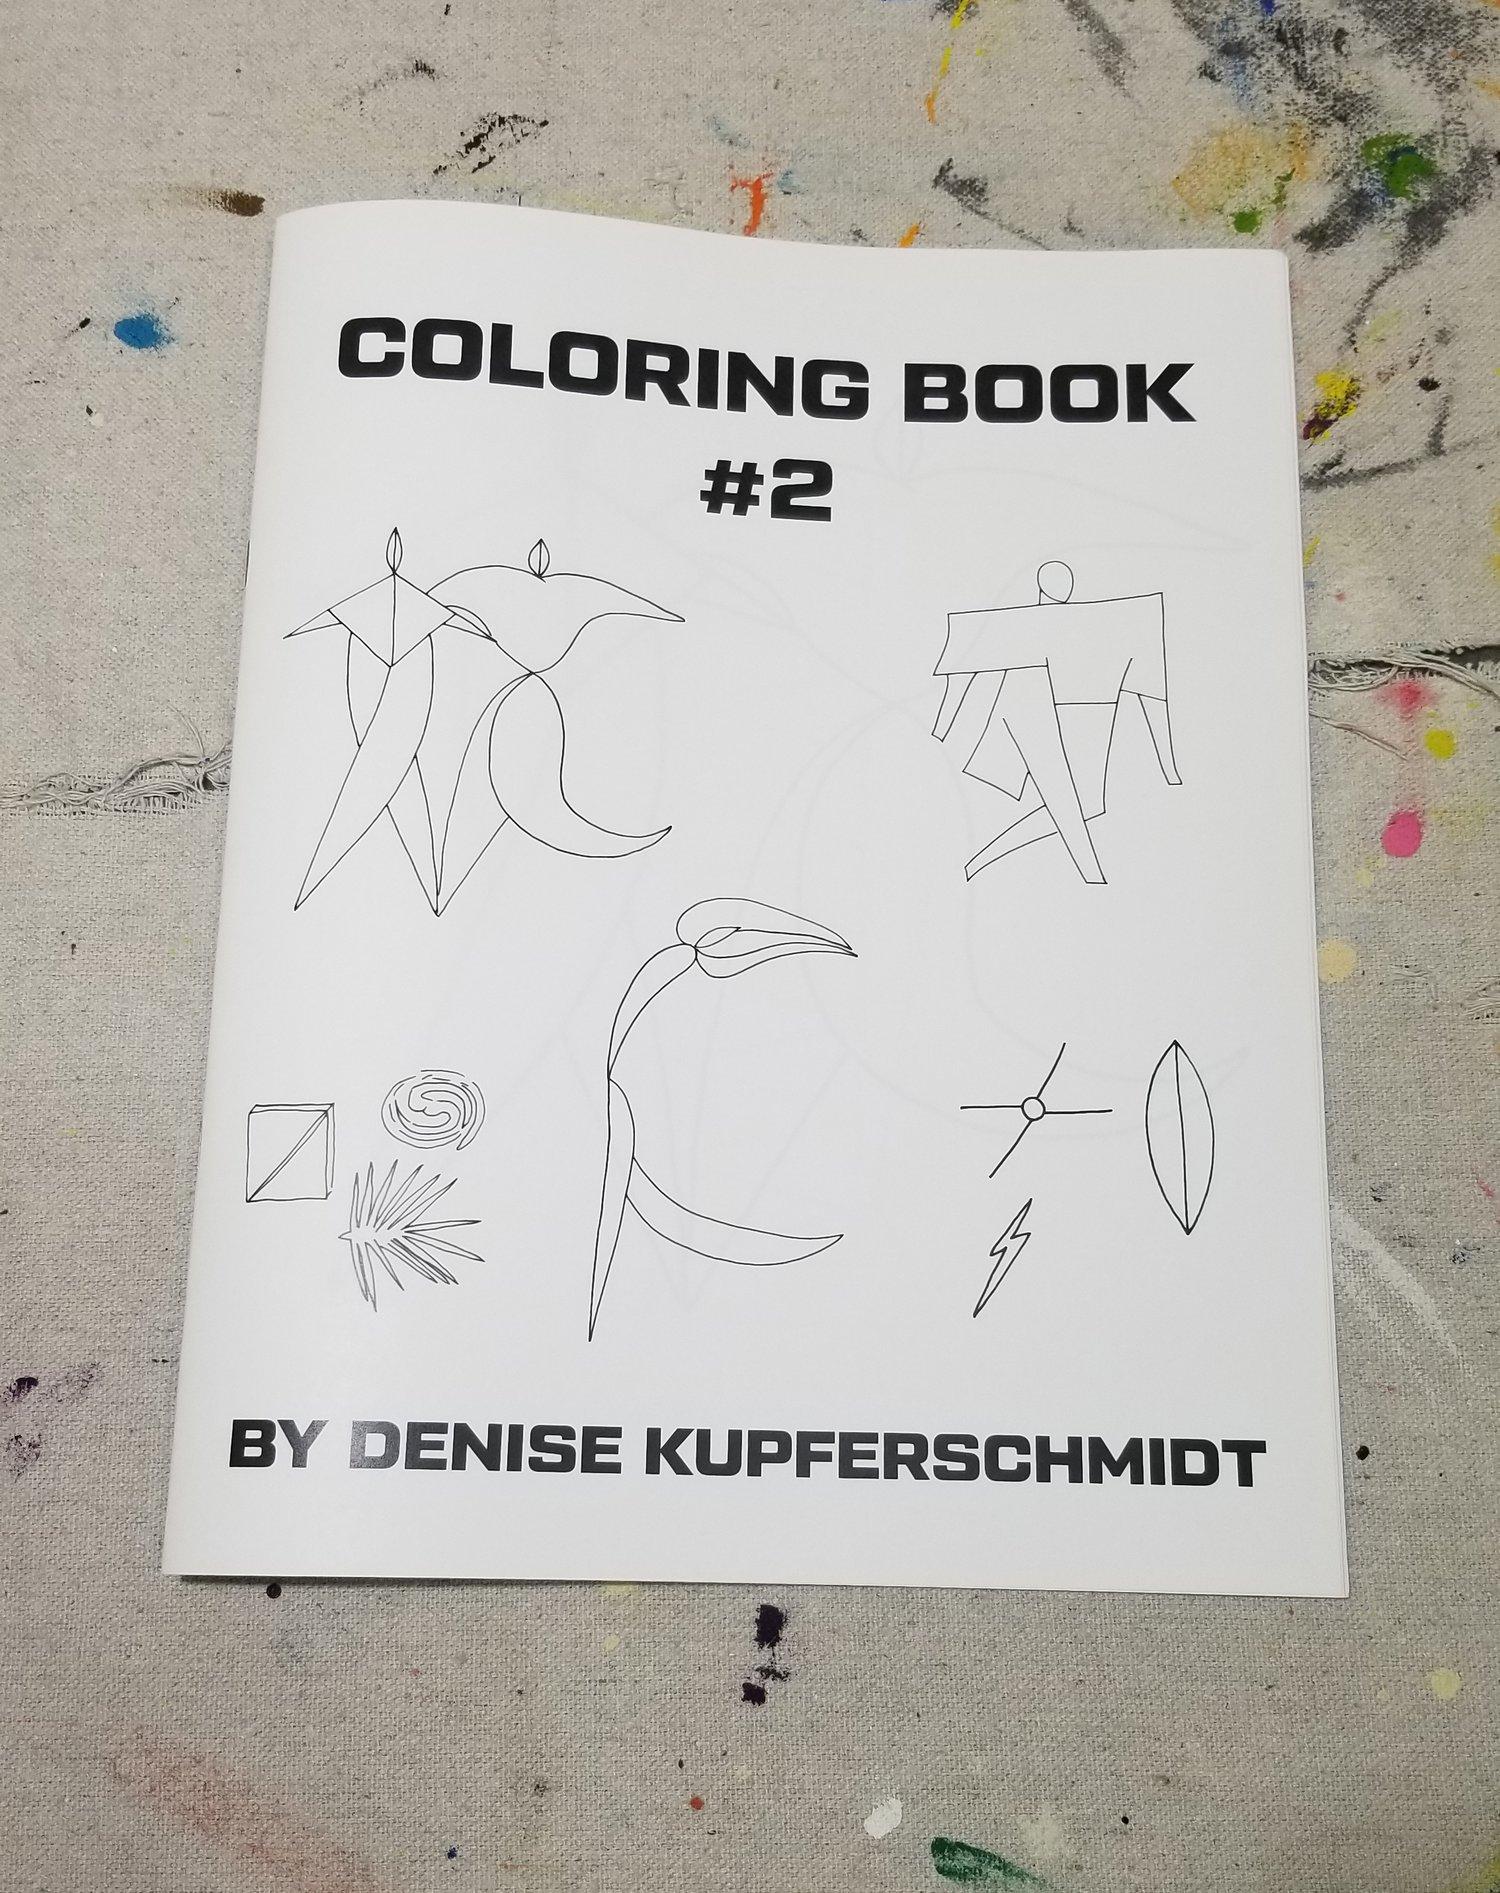 Coloring Book #2